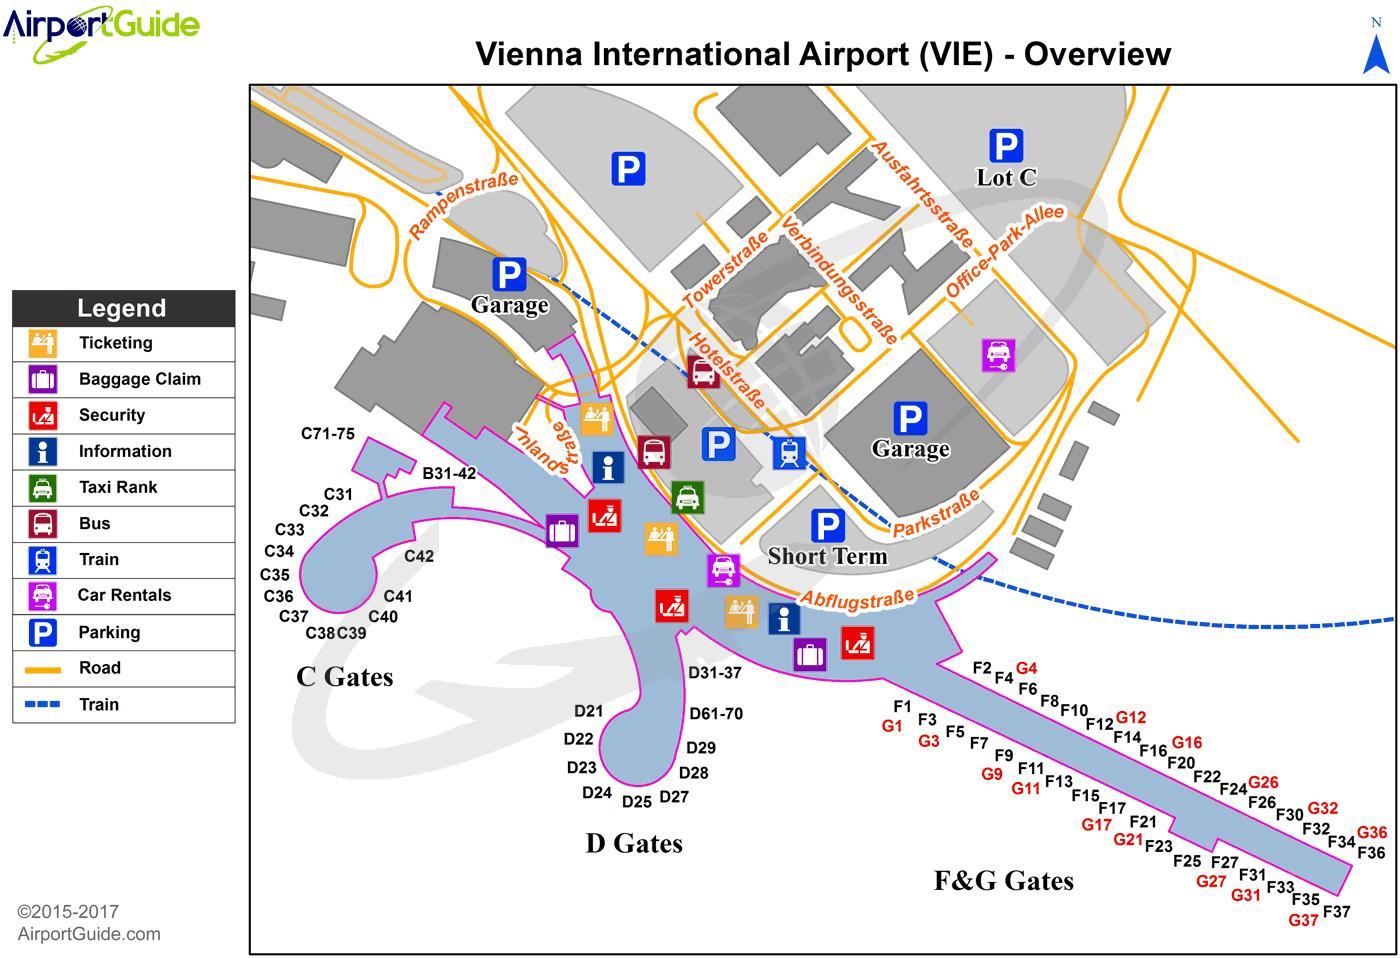 vienna airport terminal mappa - wien aeroporto mappa (austria)